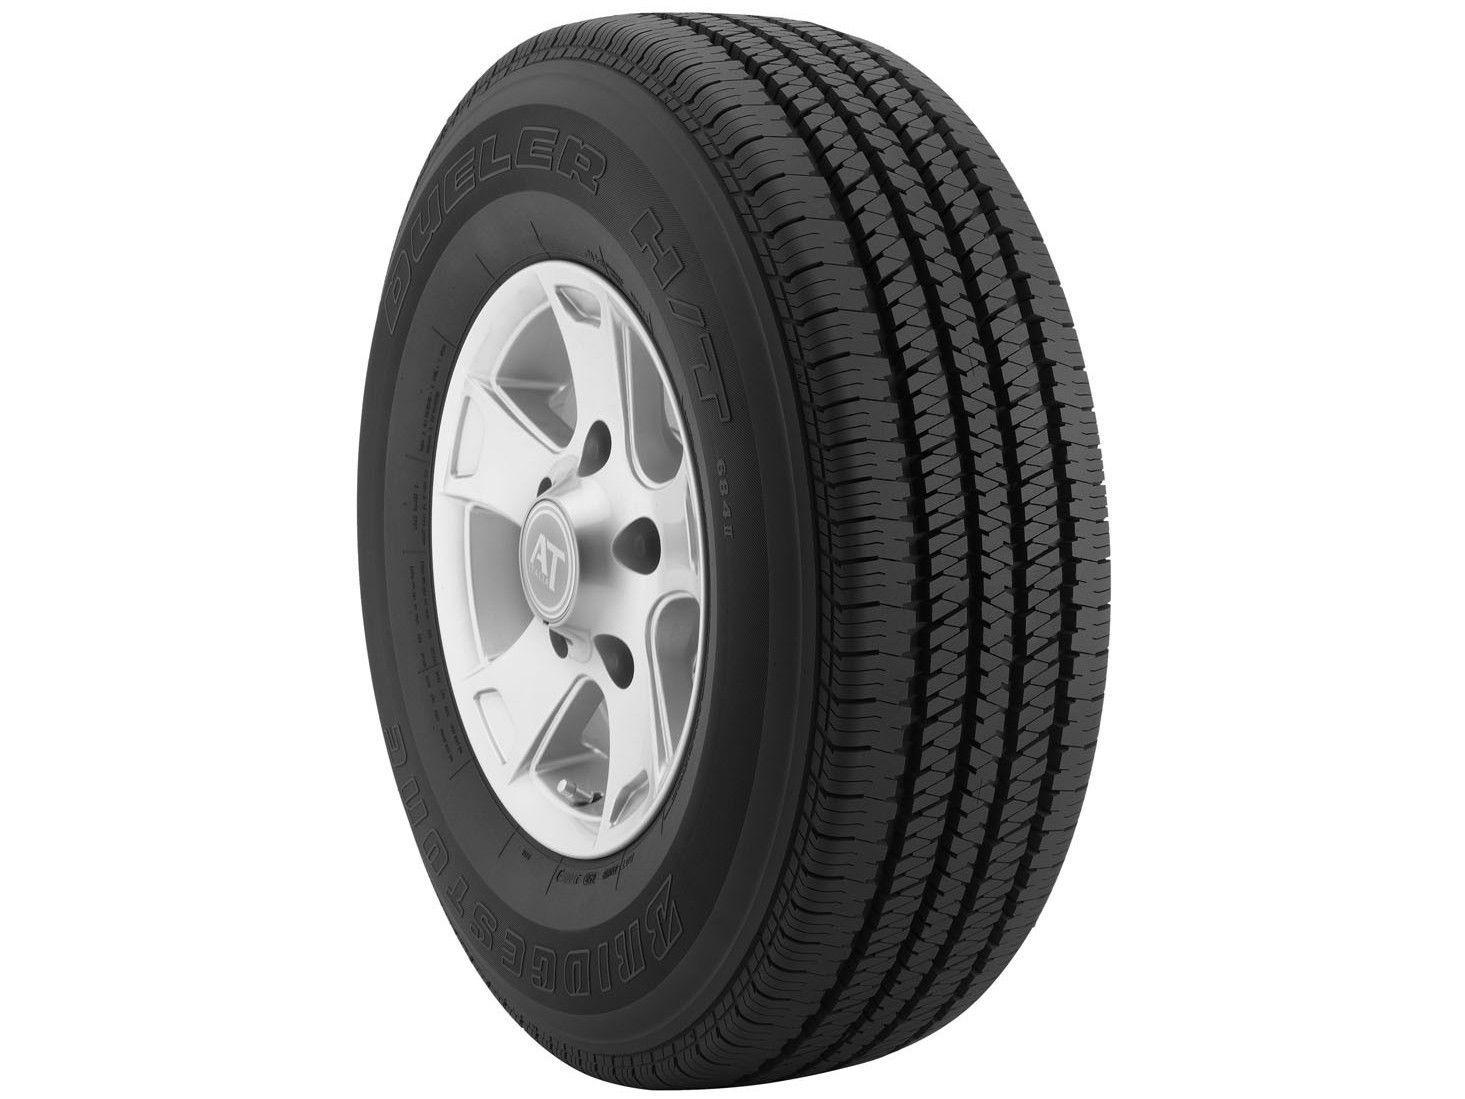 "Pneu Aro 18"" Bridgestone 265/60R18 - Dueler H/T 684 II Ecopia Caminhonete e SUV"